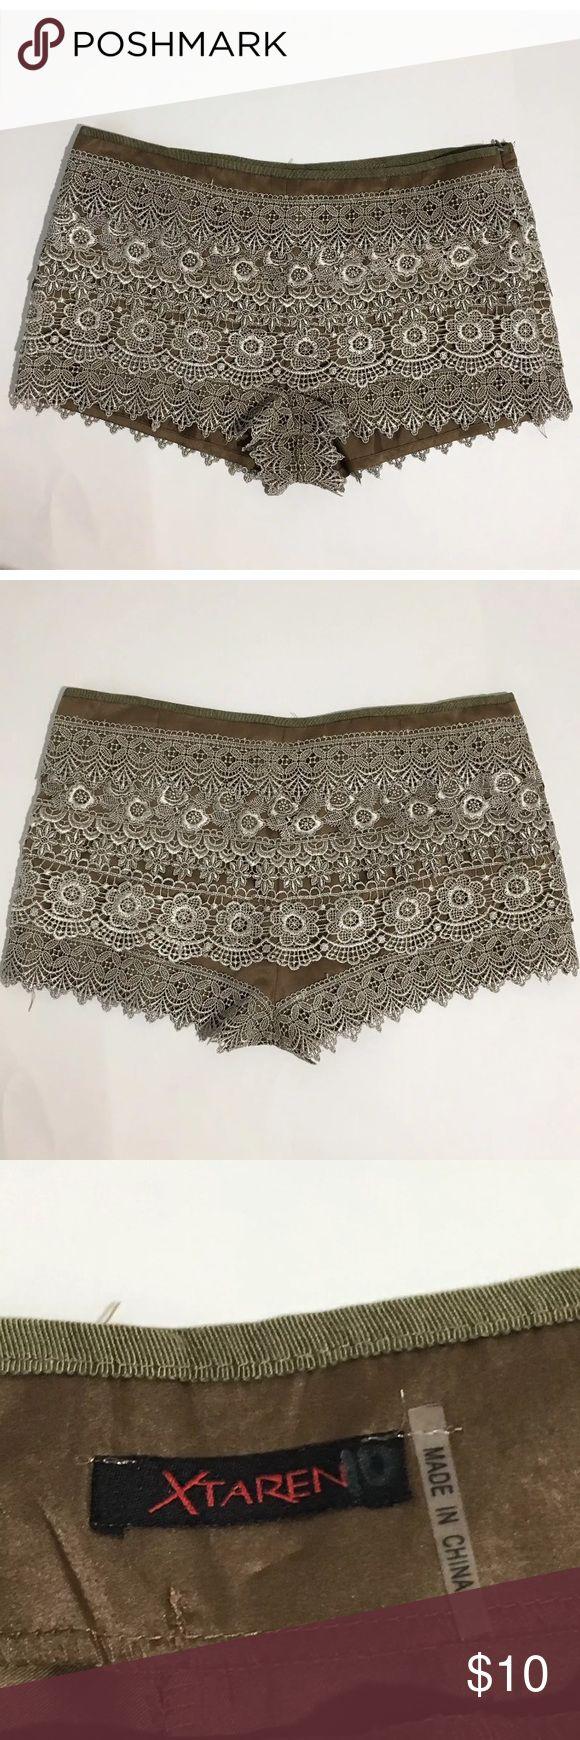 "Xtaren Women's Gold Lace Mini Shorts Shorts Women's Xtaren gold faux satin and lace shorts with side zipper. No size tag or care tag. waist is 16"" laying flat, 10"" waist to hem. Xtaren Shorts"